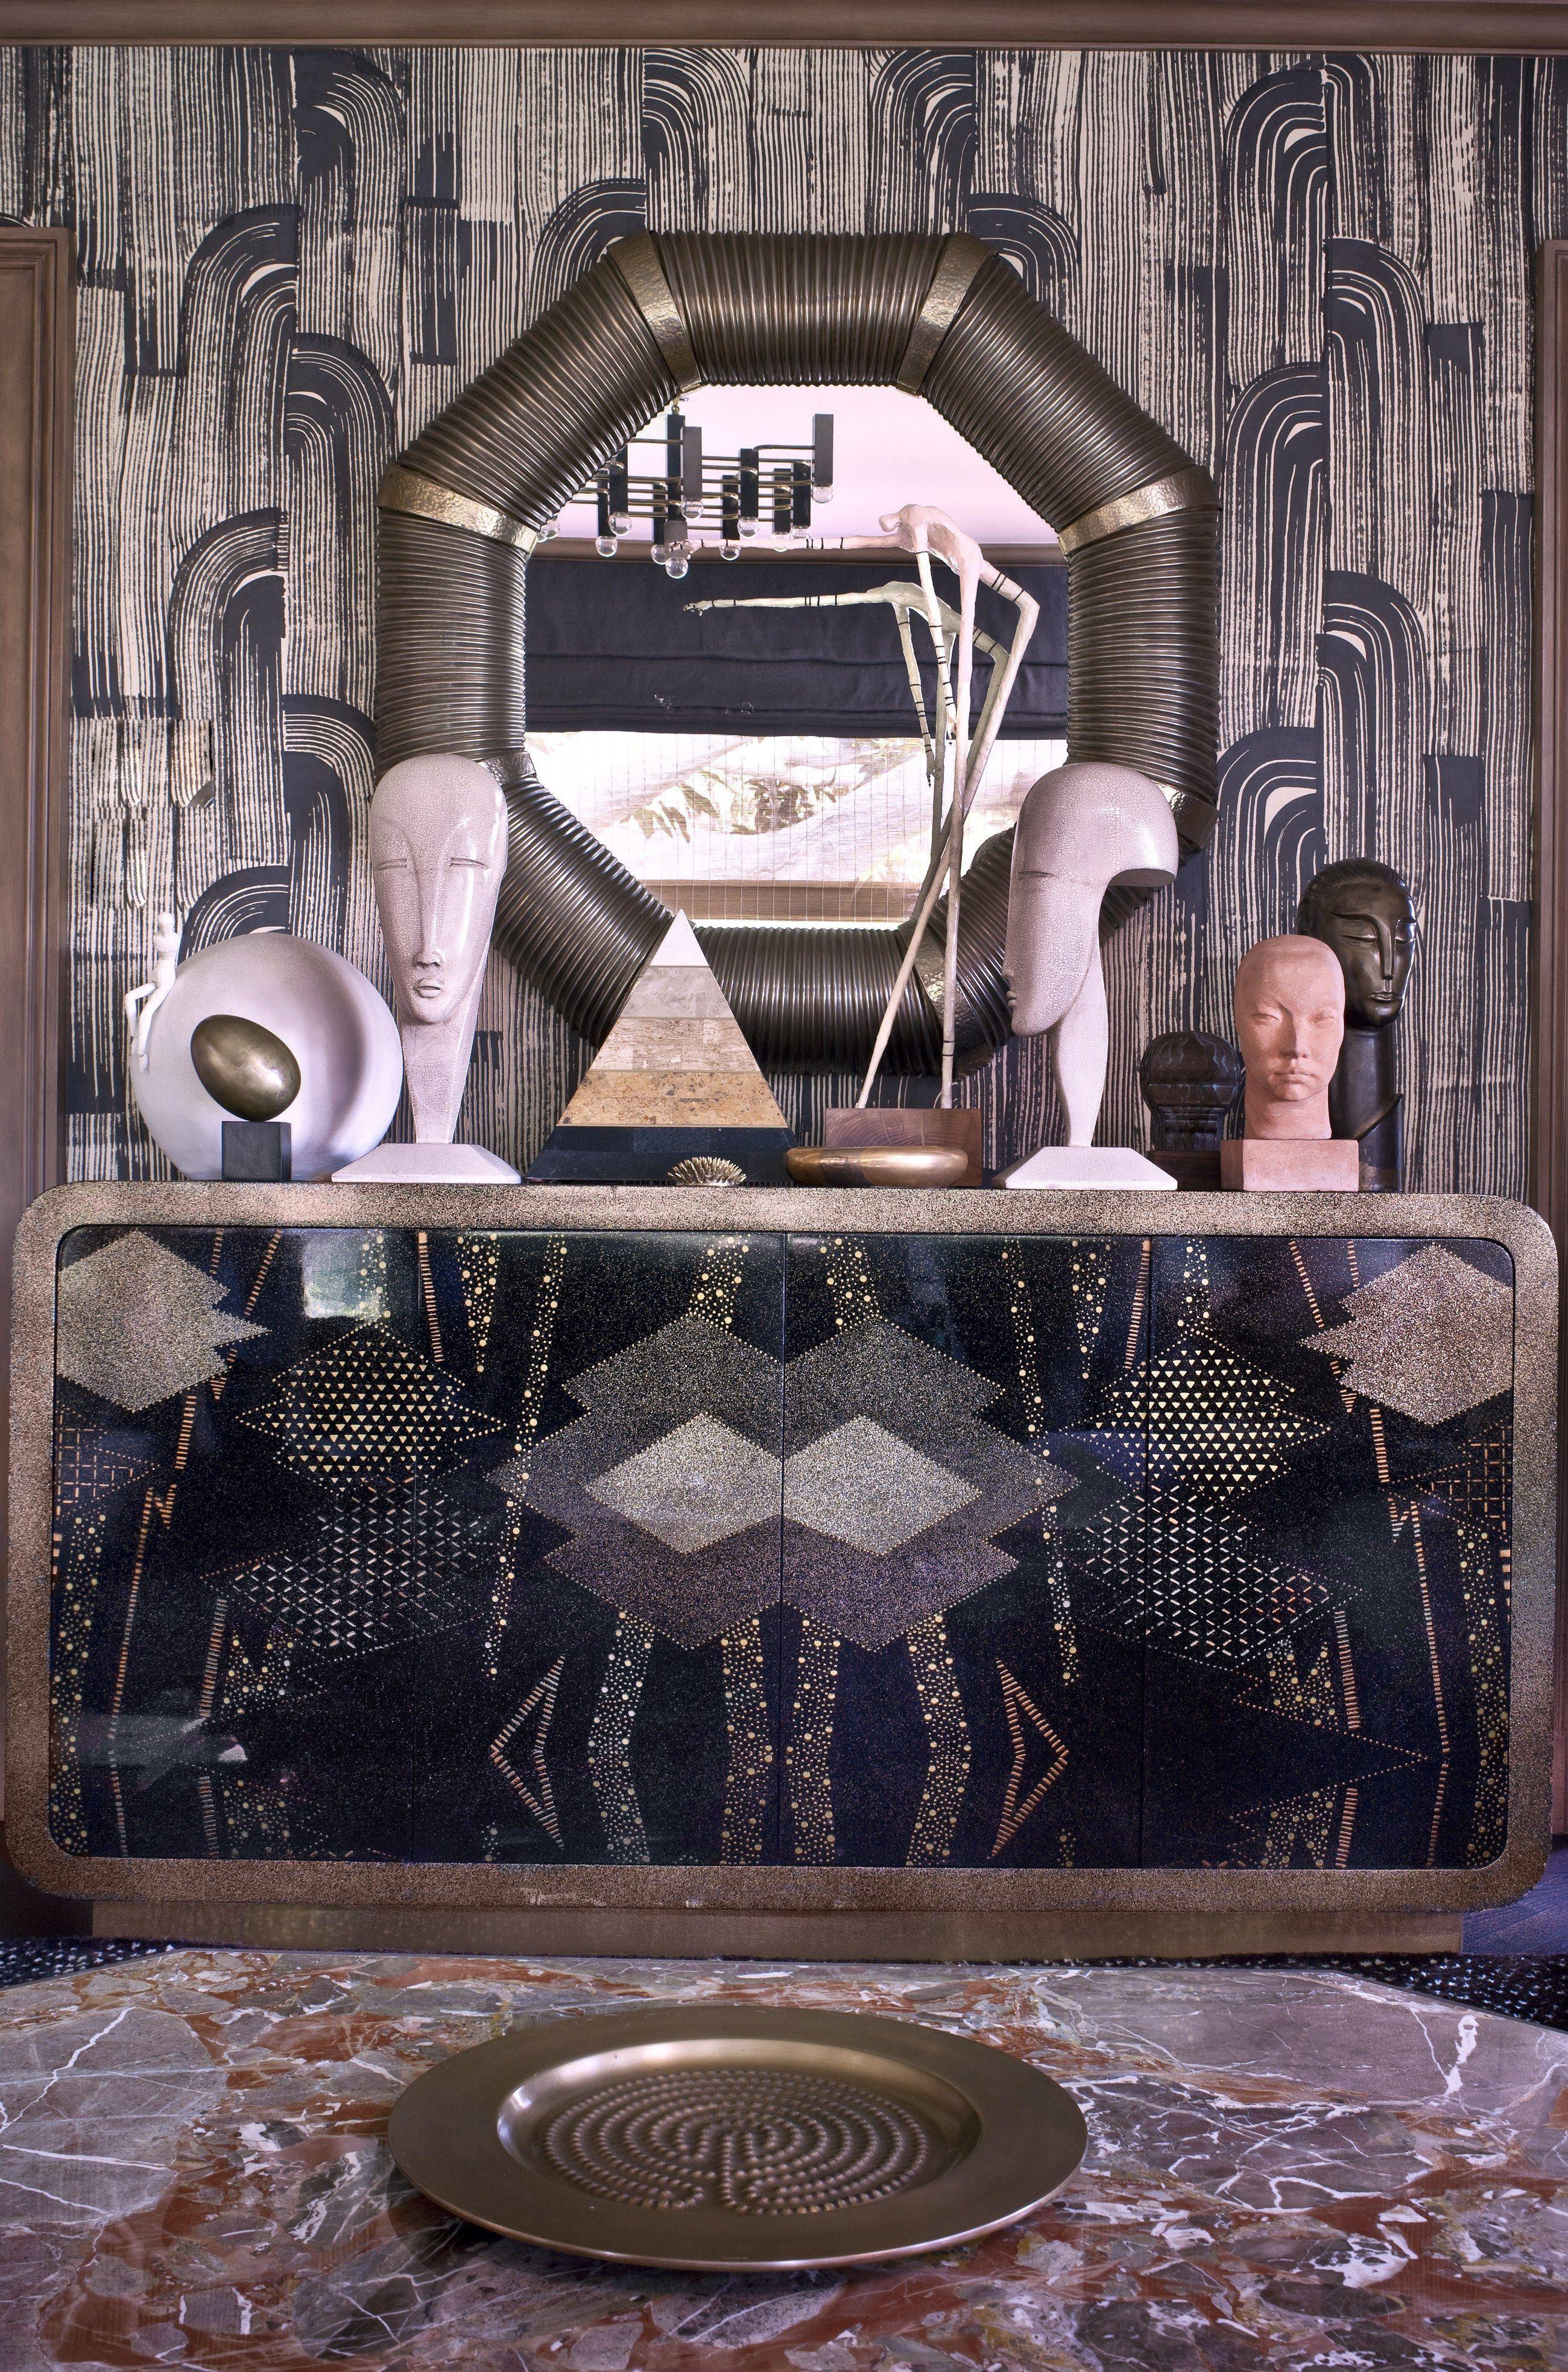 HOMMÉS STUDIO selection of tabletop ceramics, pottery and